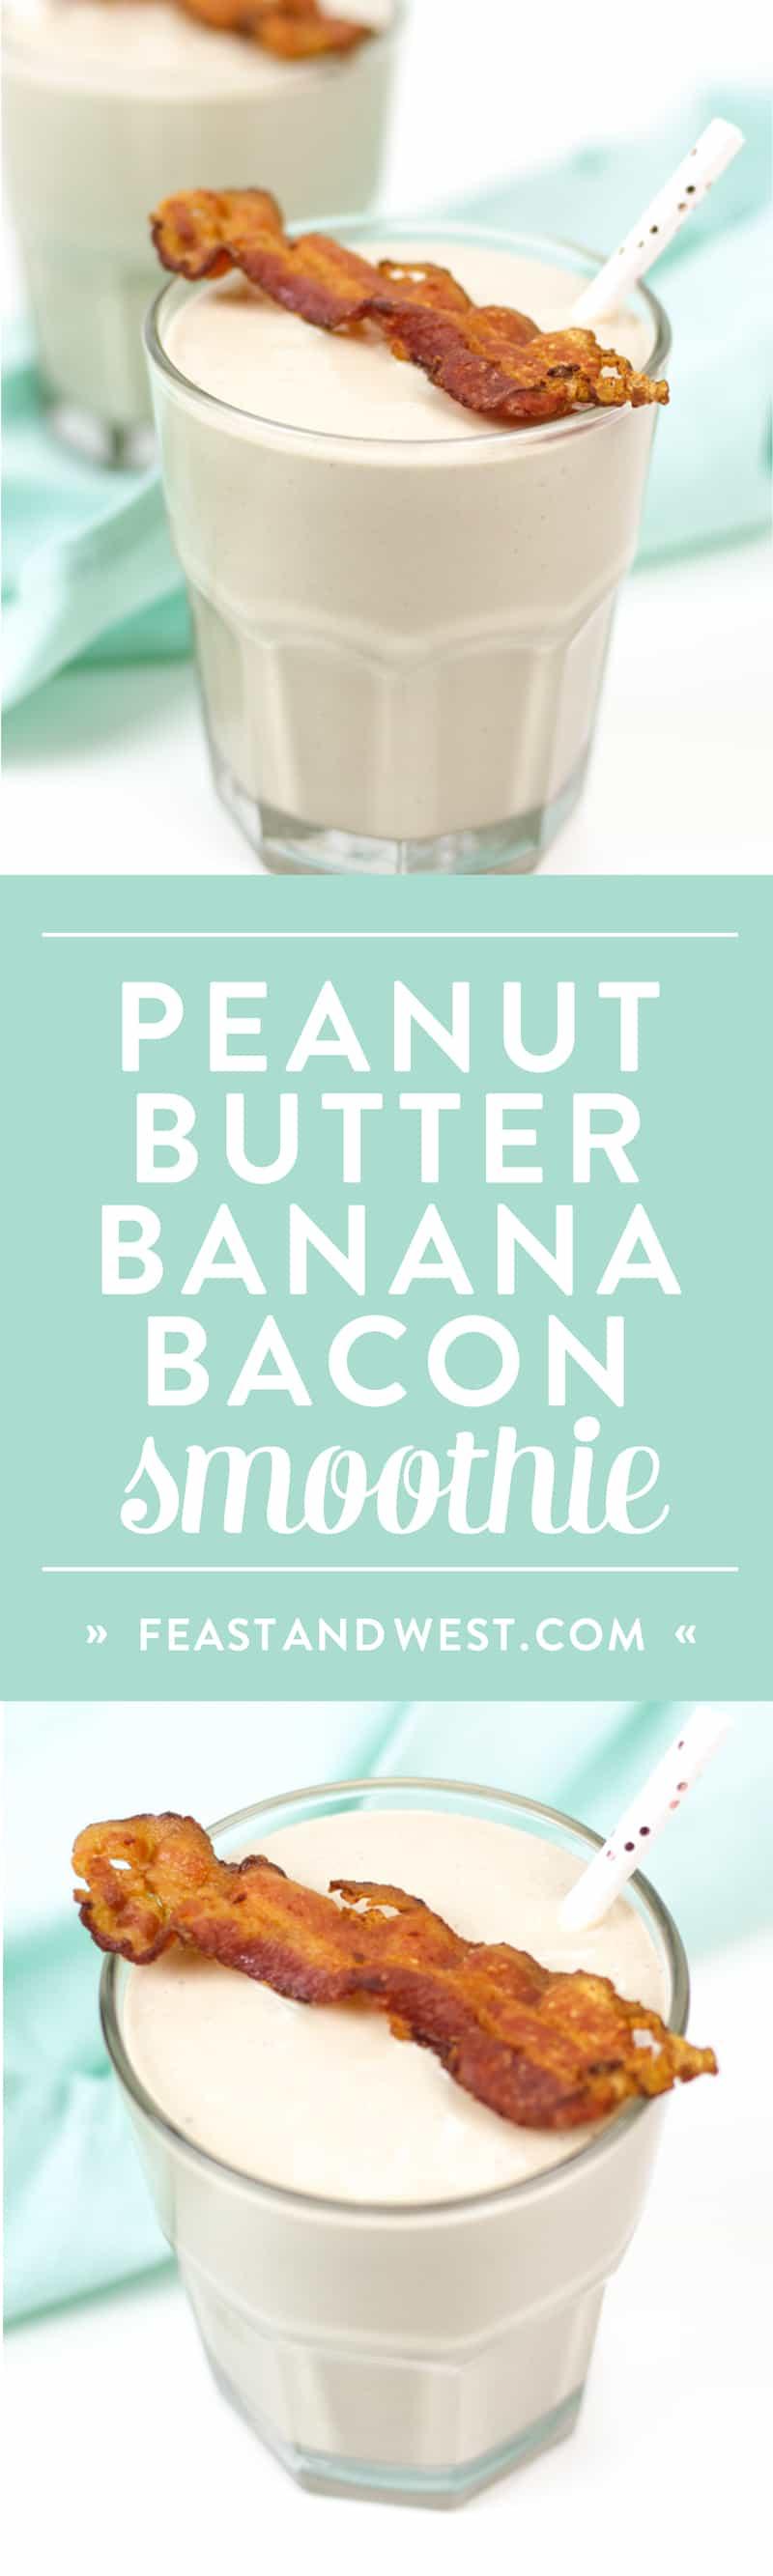 Peanut Butter Banana Bacon Elvis Smoothie